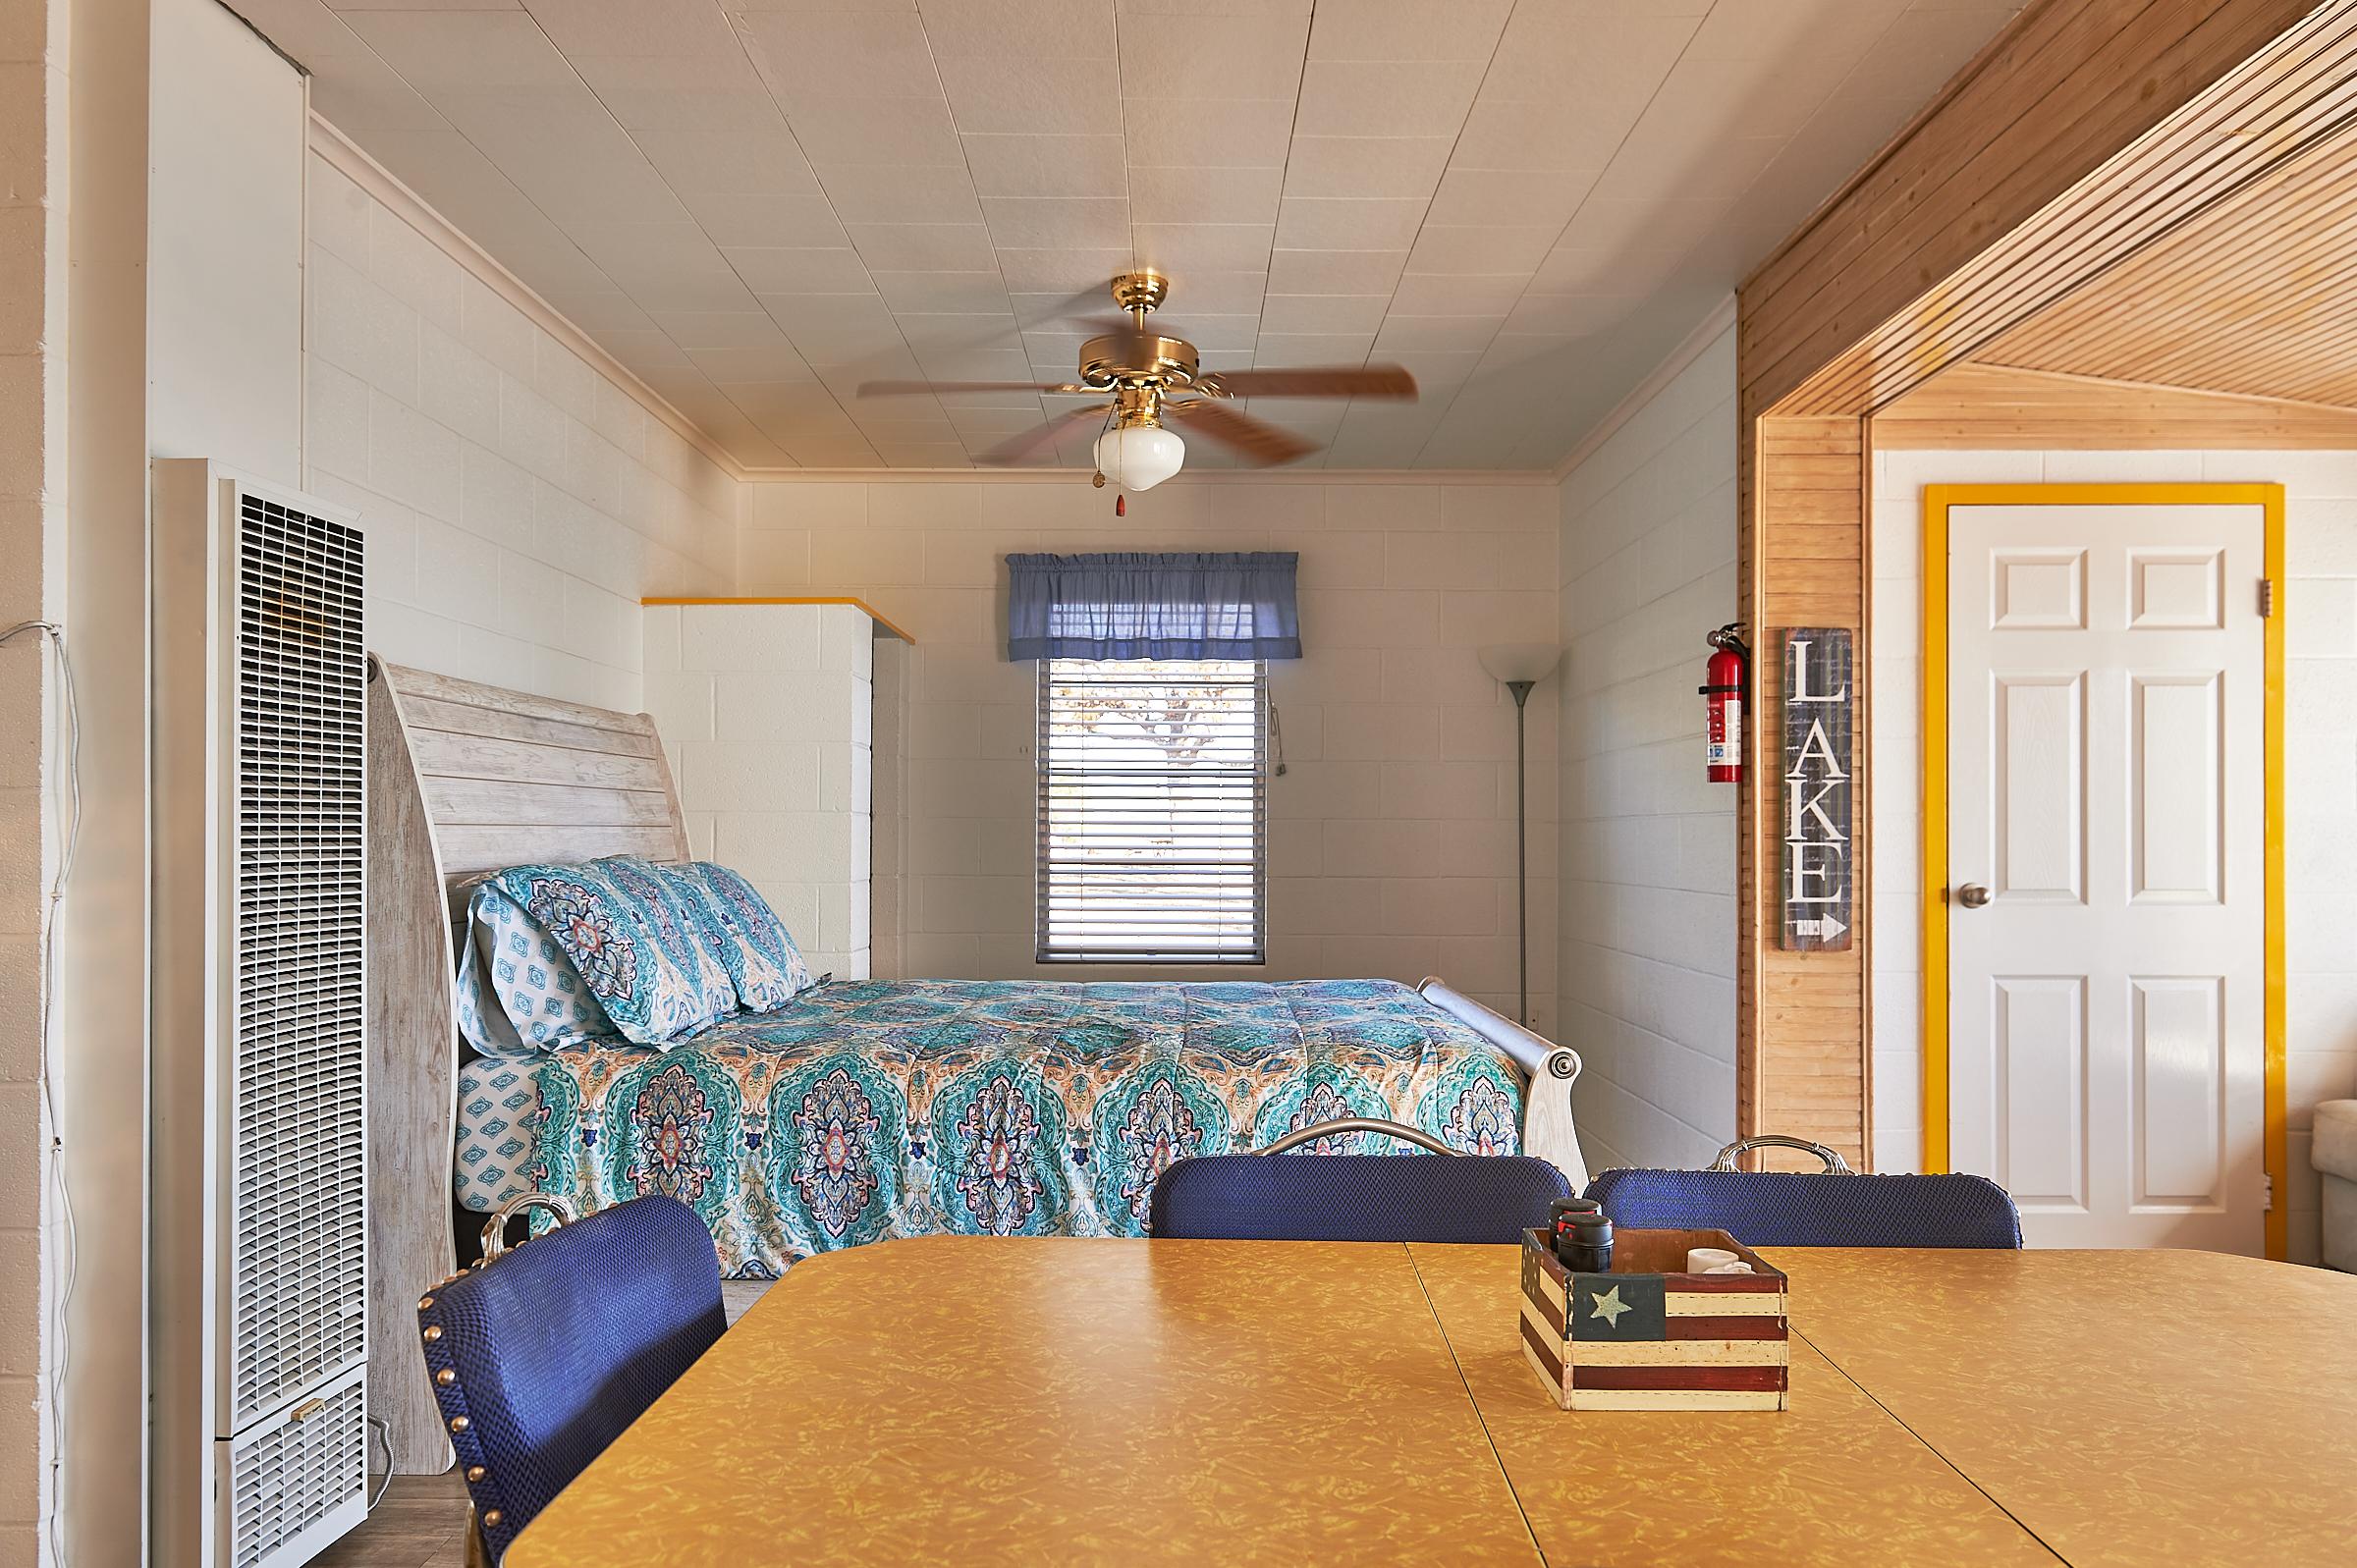 Bluebonnet Cabin Common Area and Closet